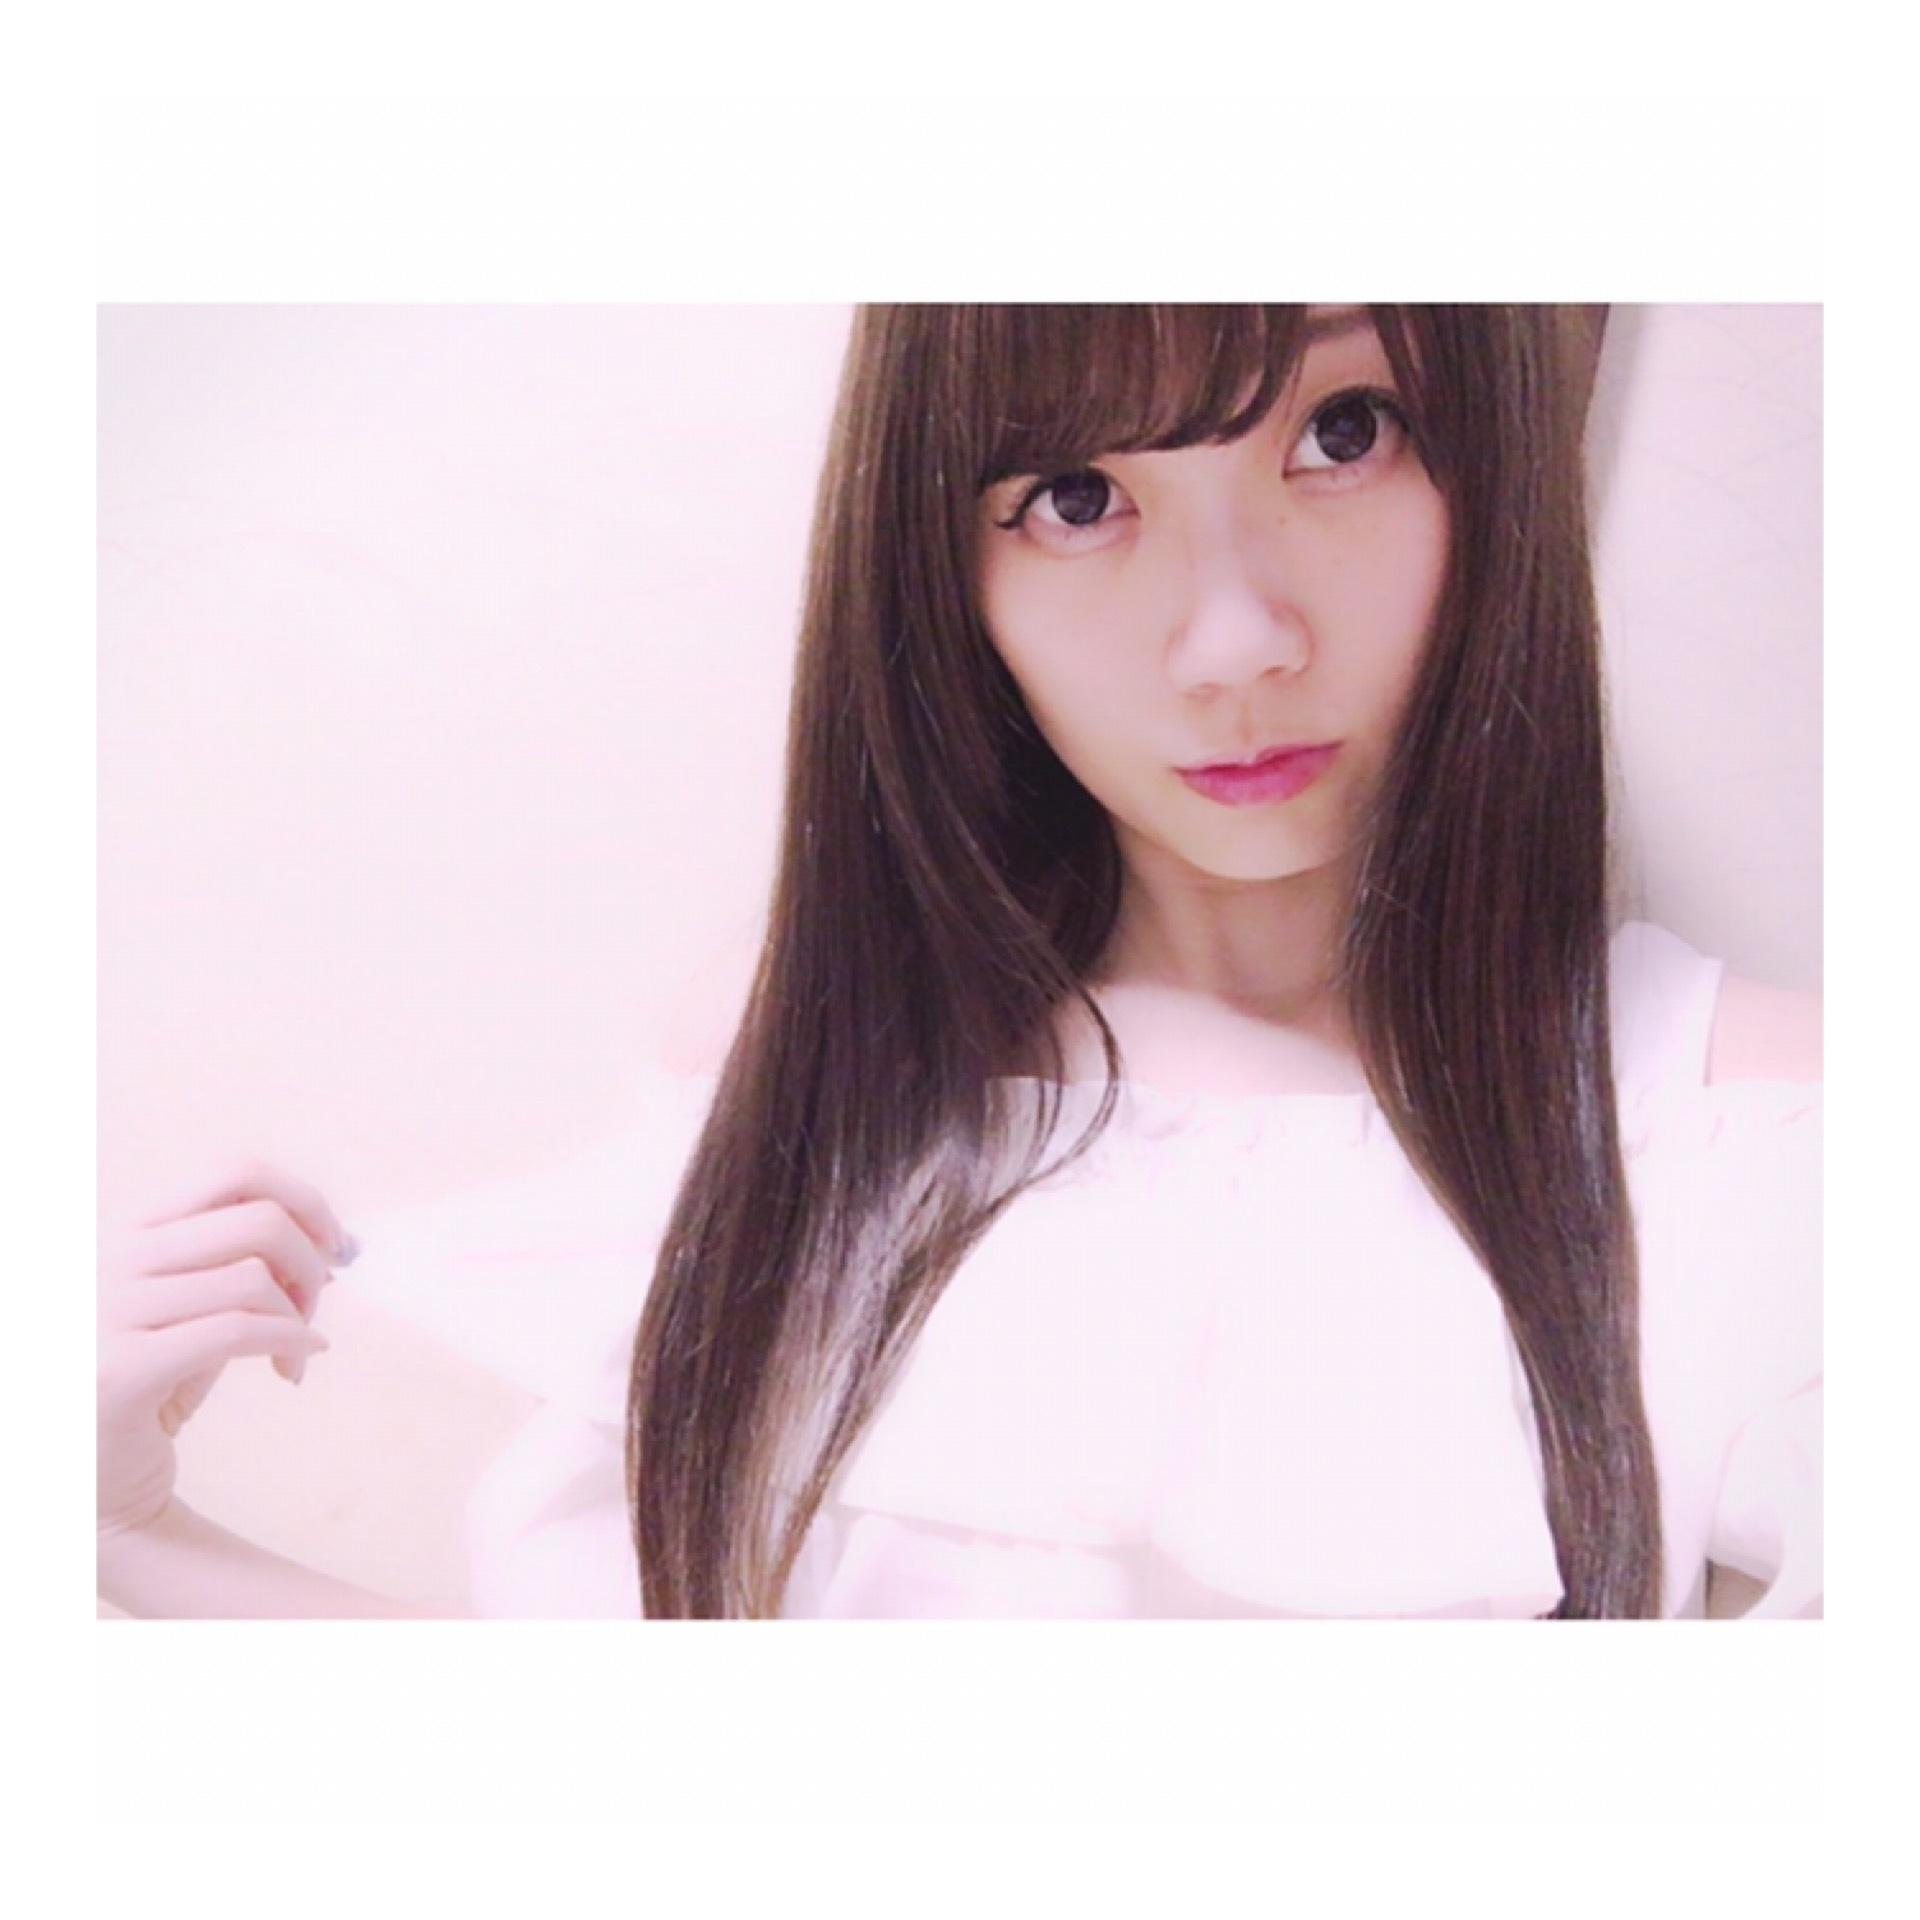 E hyphen world gallery♡ファッション通販サイト《FLAG SHOP》購入品♩_1_2